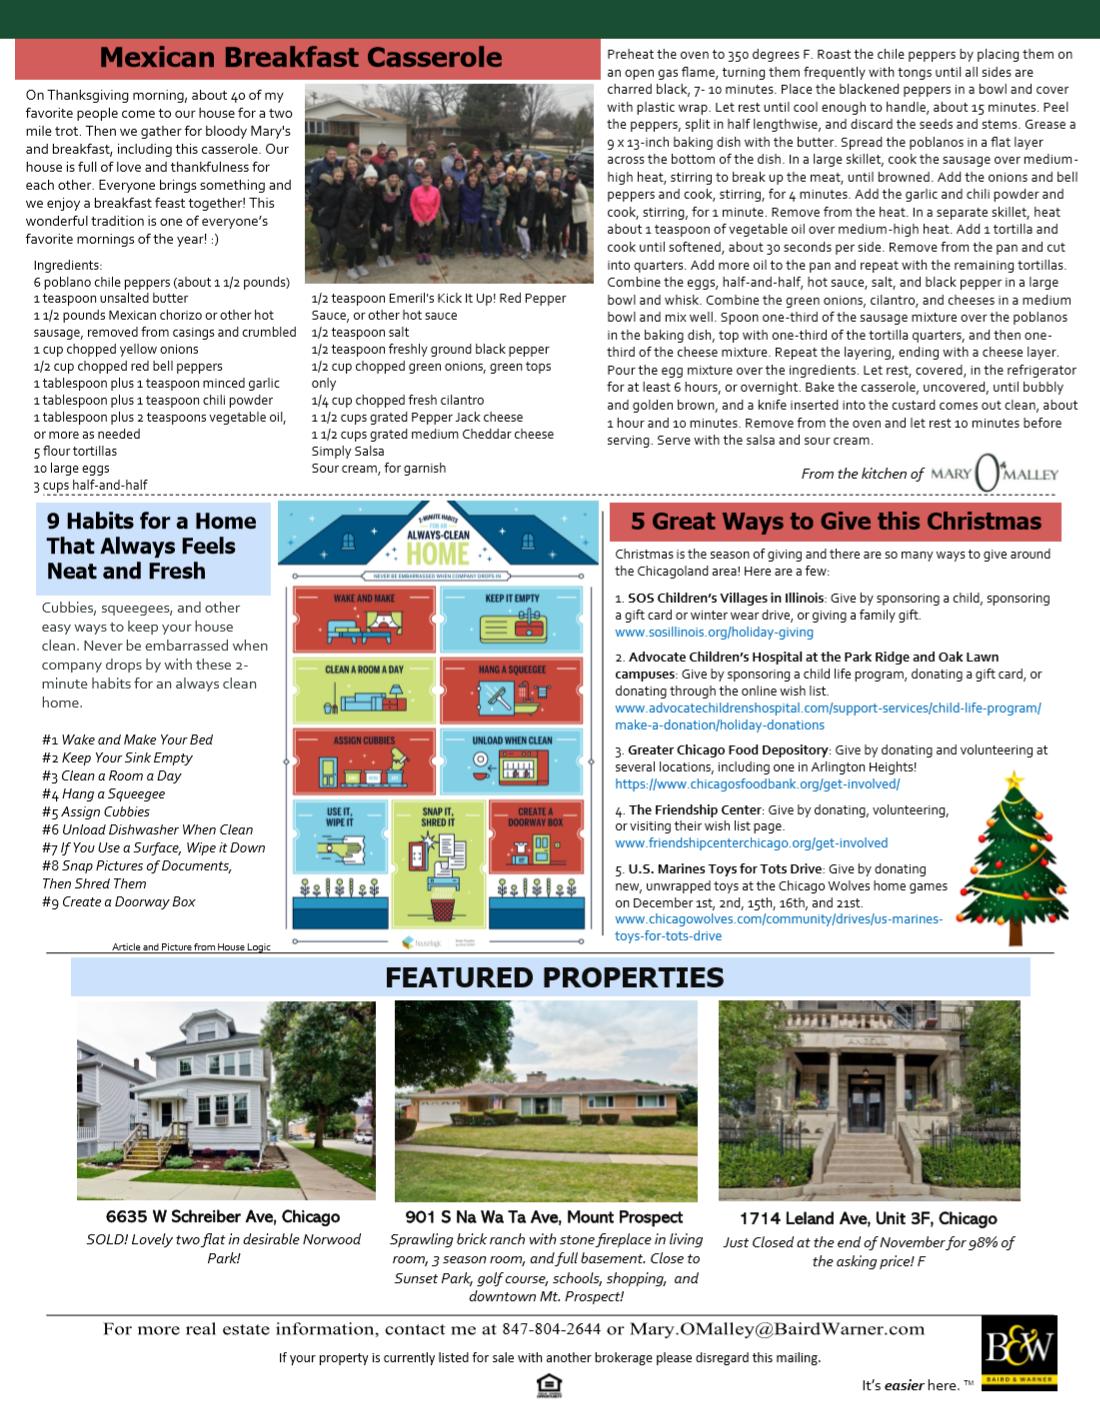 Newsletter for Chicago real estate agent